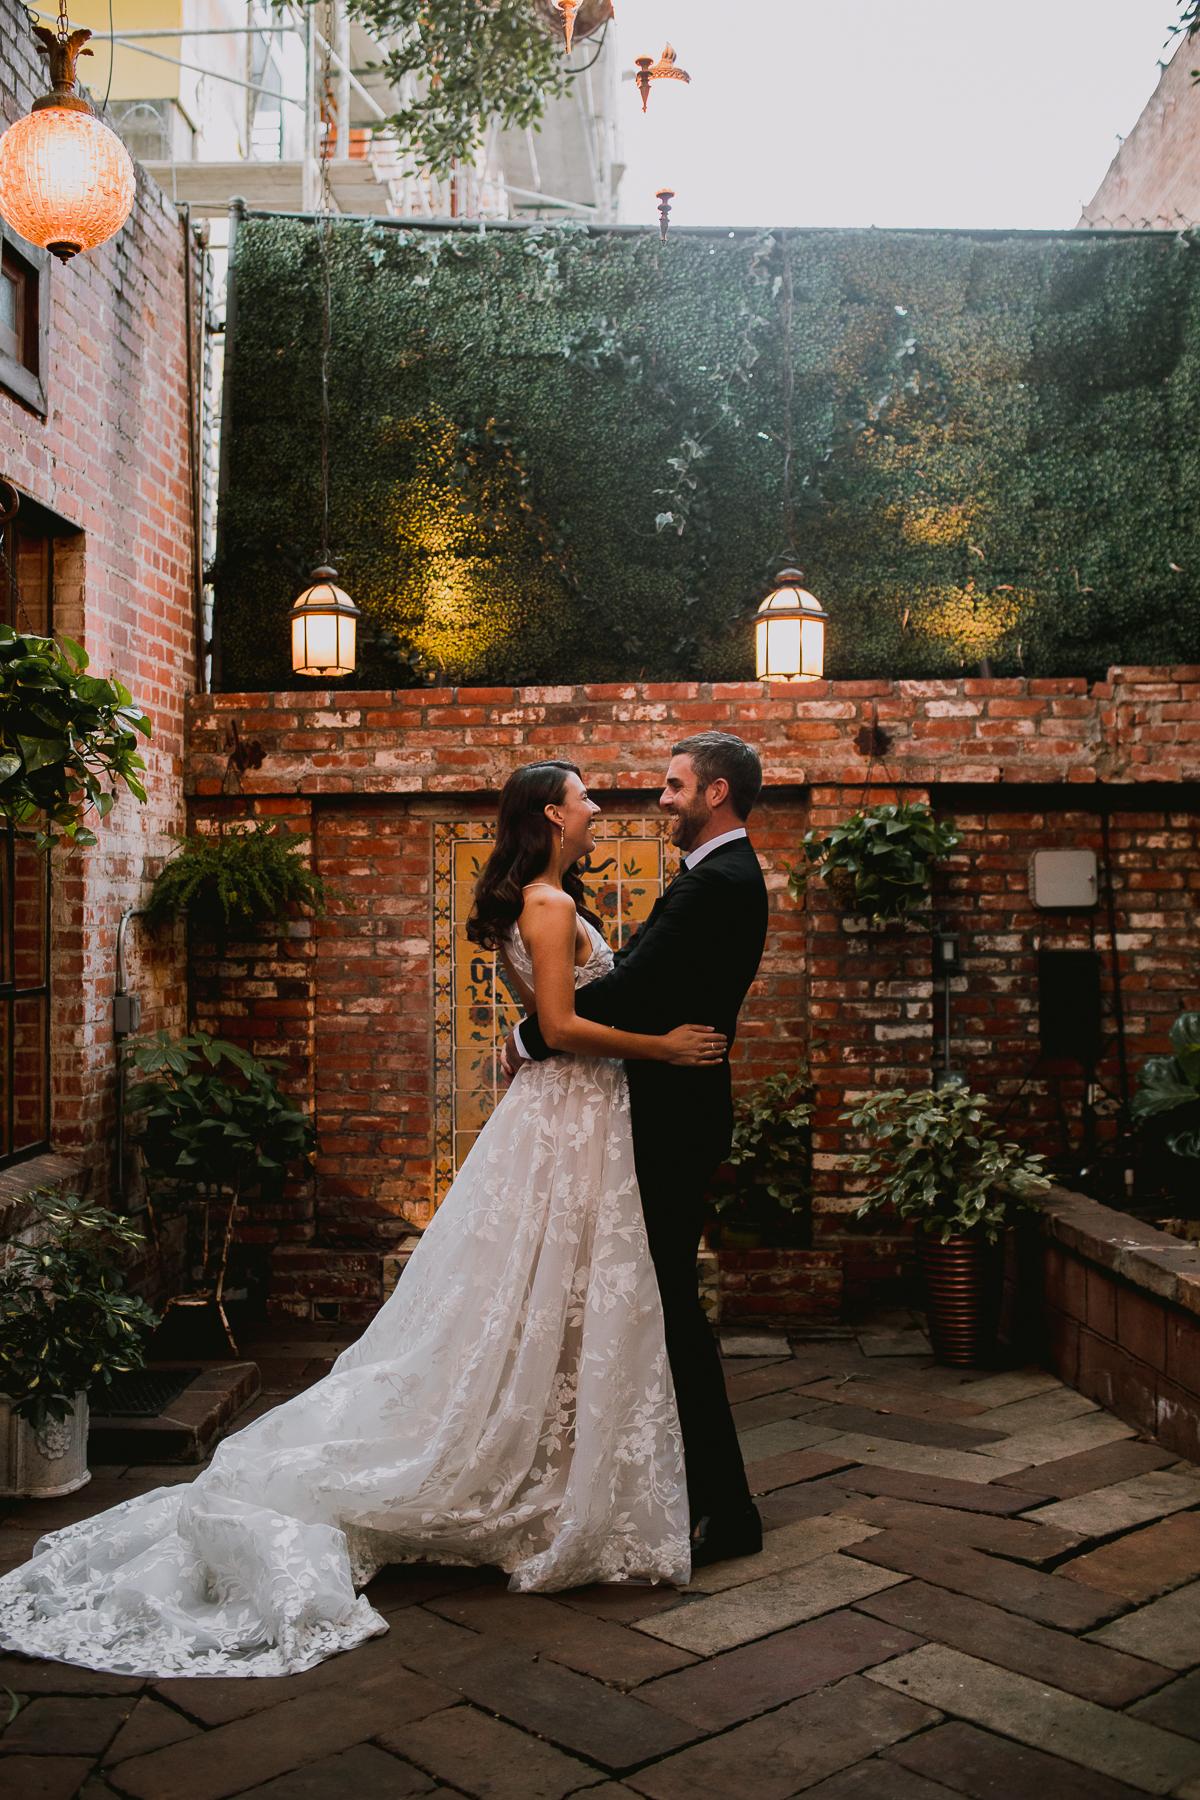 carondelet-house-kelley-raye-los-angeles-wedding-photographer-36.jpg